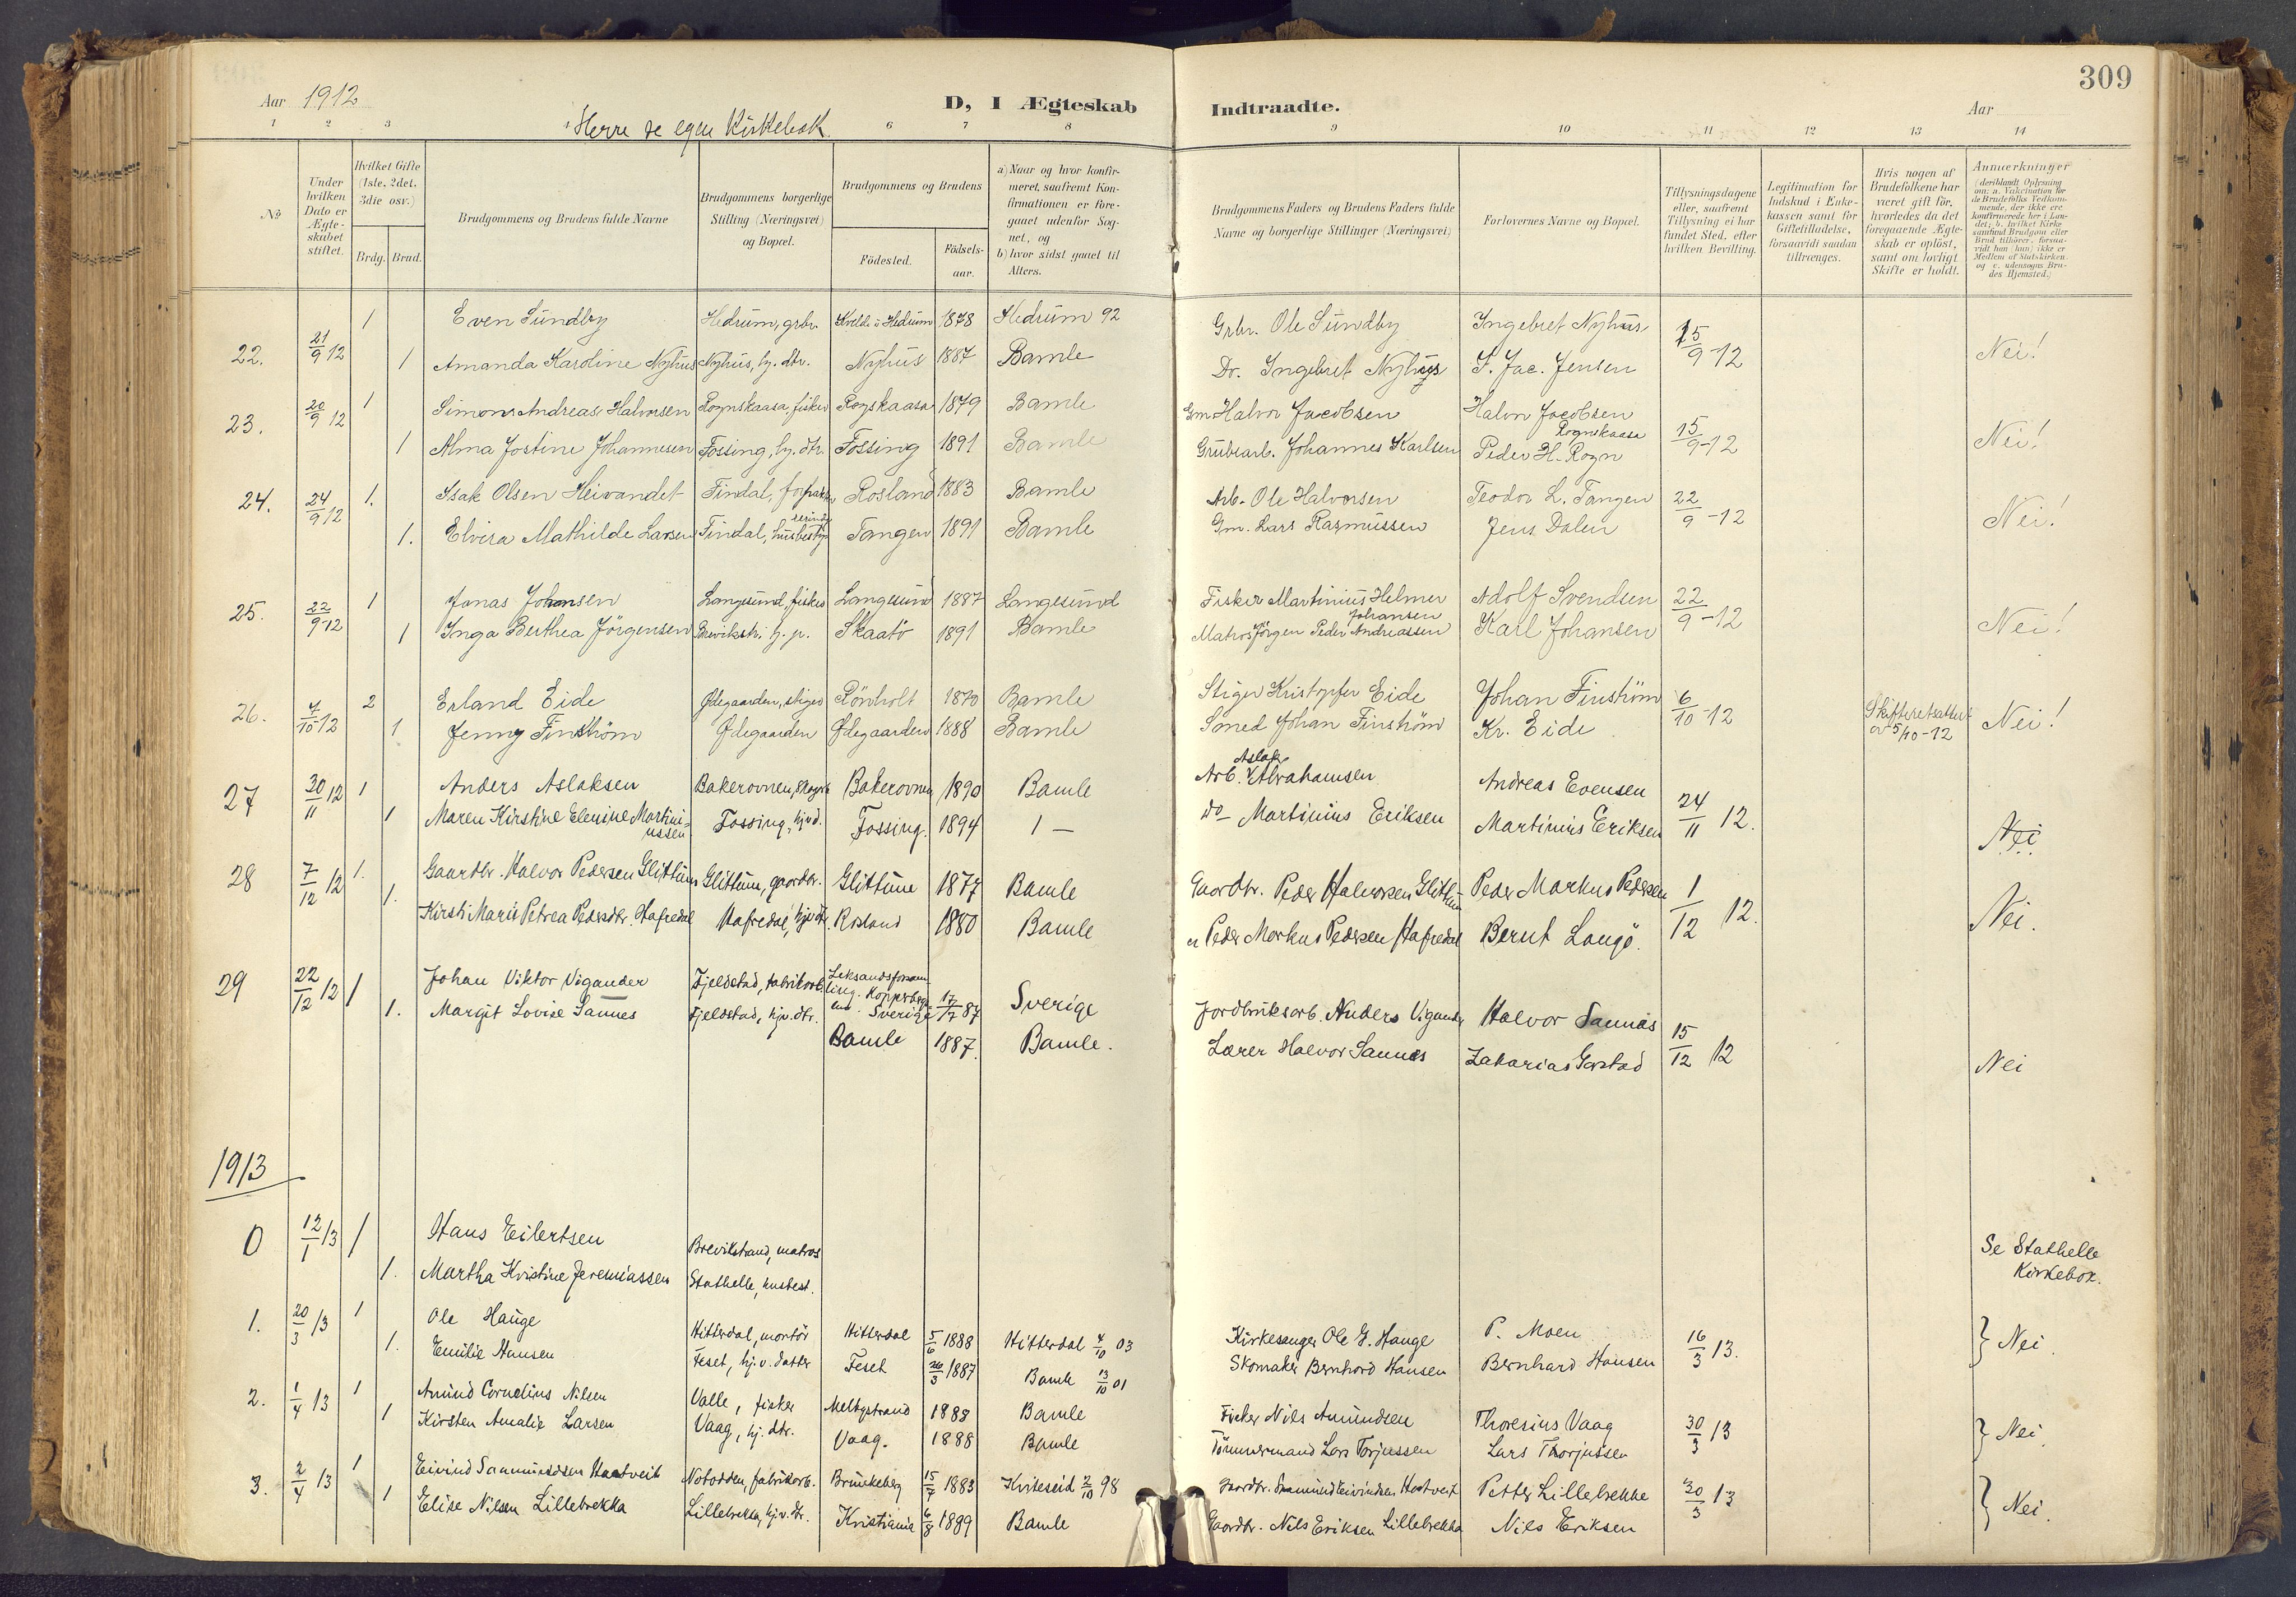 SAKO, Bamble kirkebøker, F/Fa/L0009: Ministerialbok nr. I 9, 1901-1917, s. 309